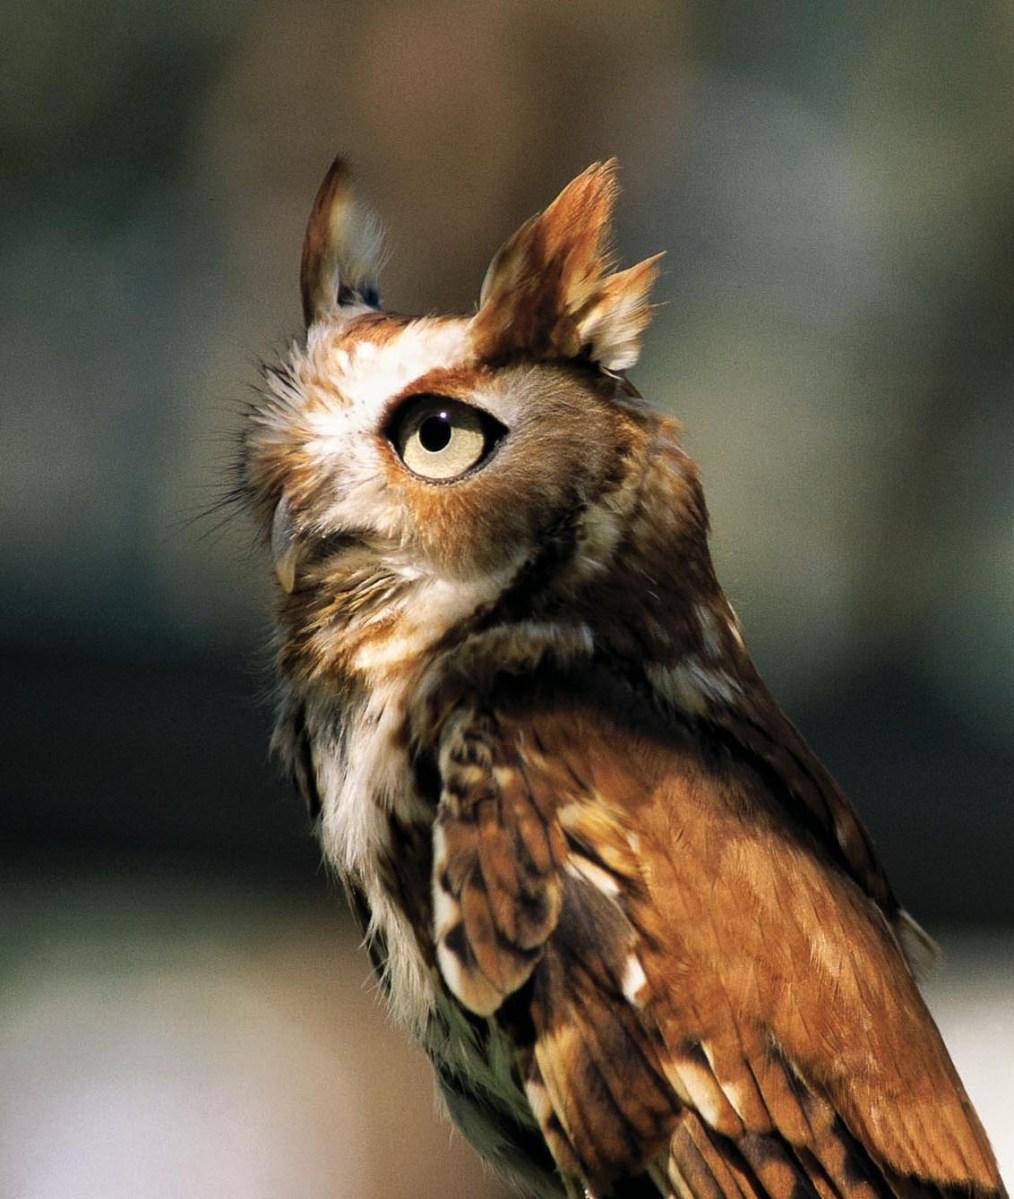 Eastern screech-owl: Tiny hunter of the night | My Chicago Botanic